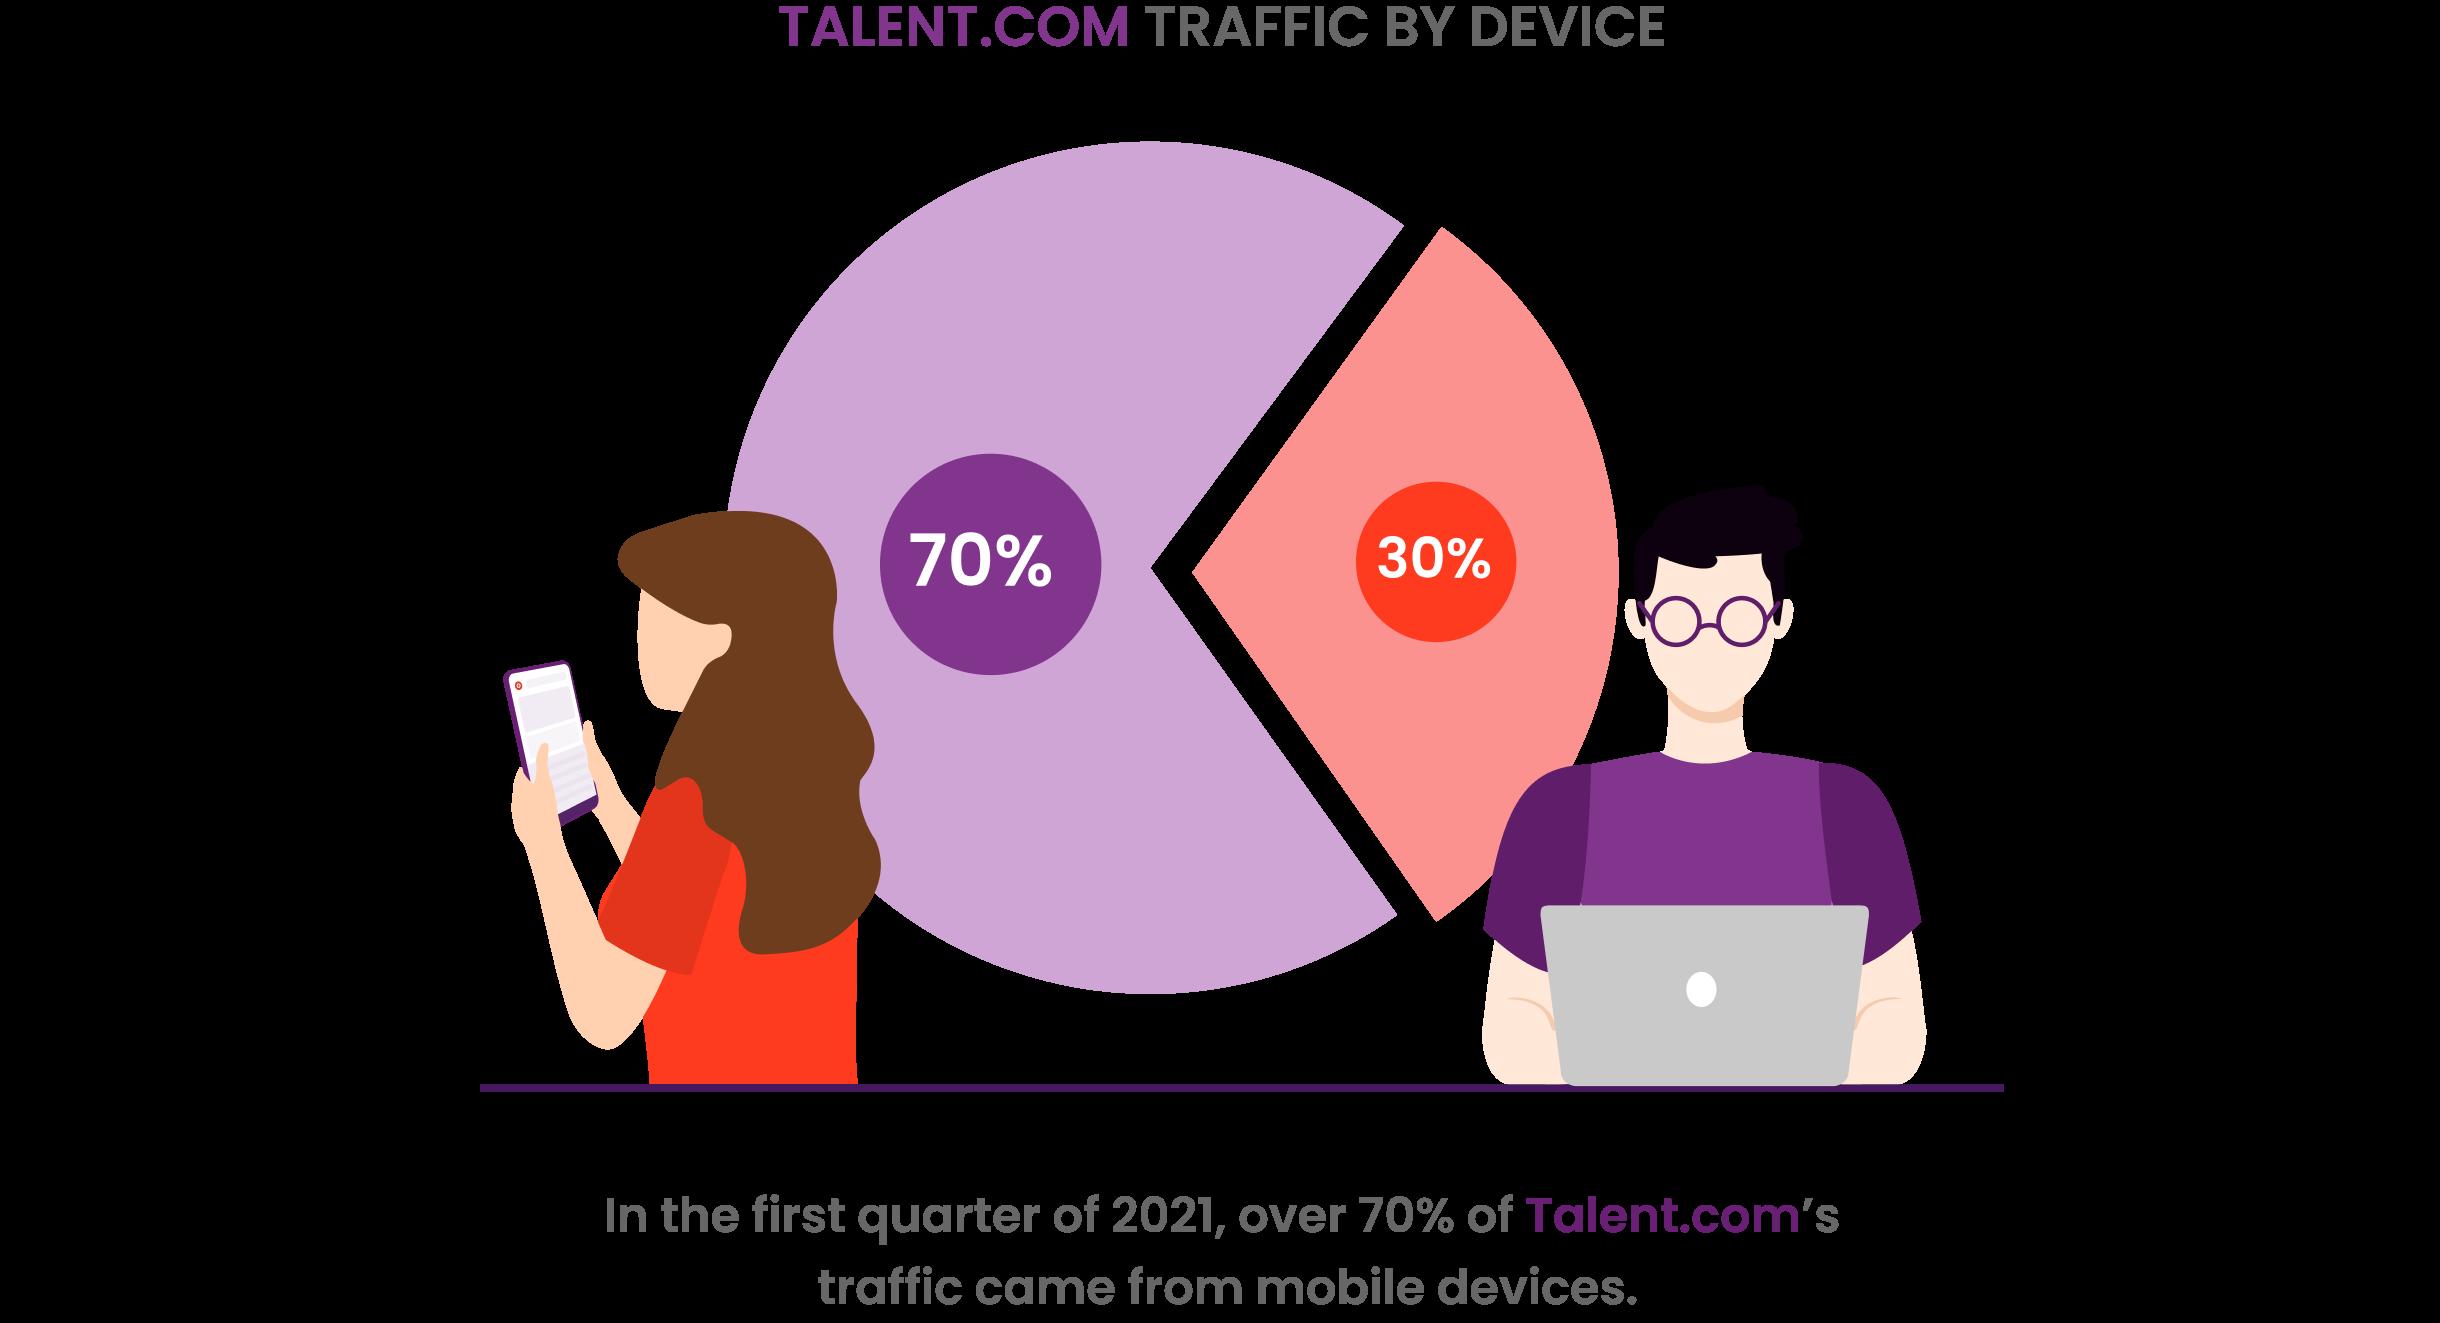 Mobile dominates traffic on Talent.com